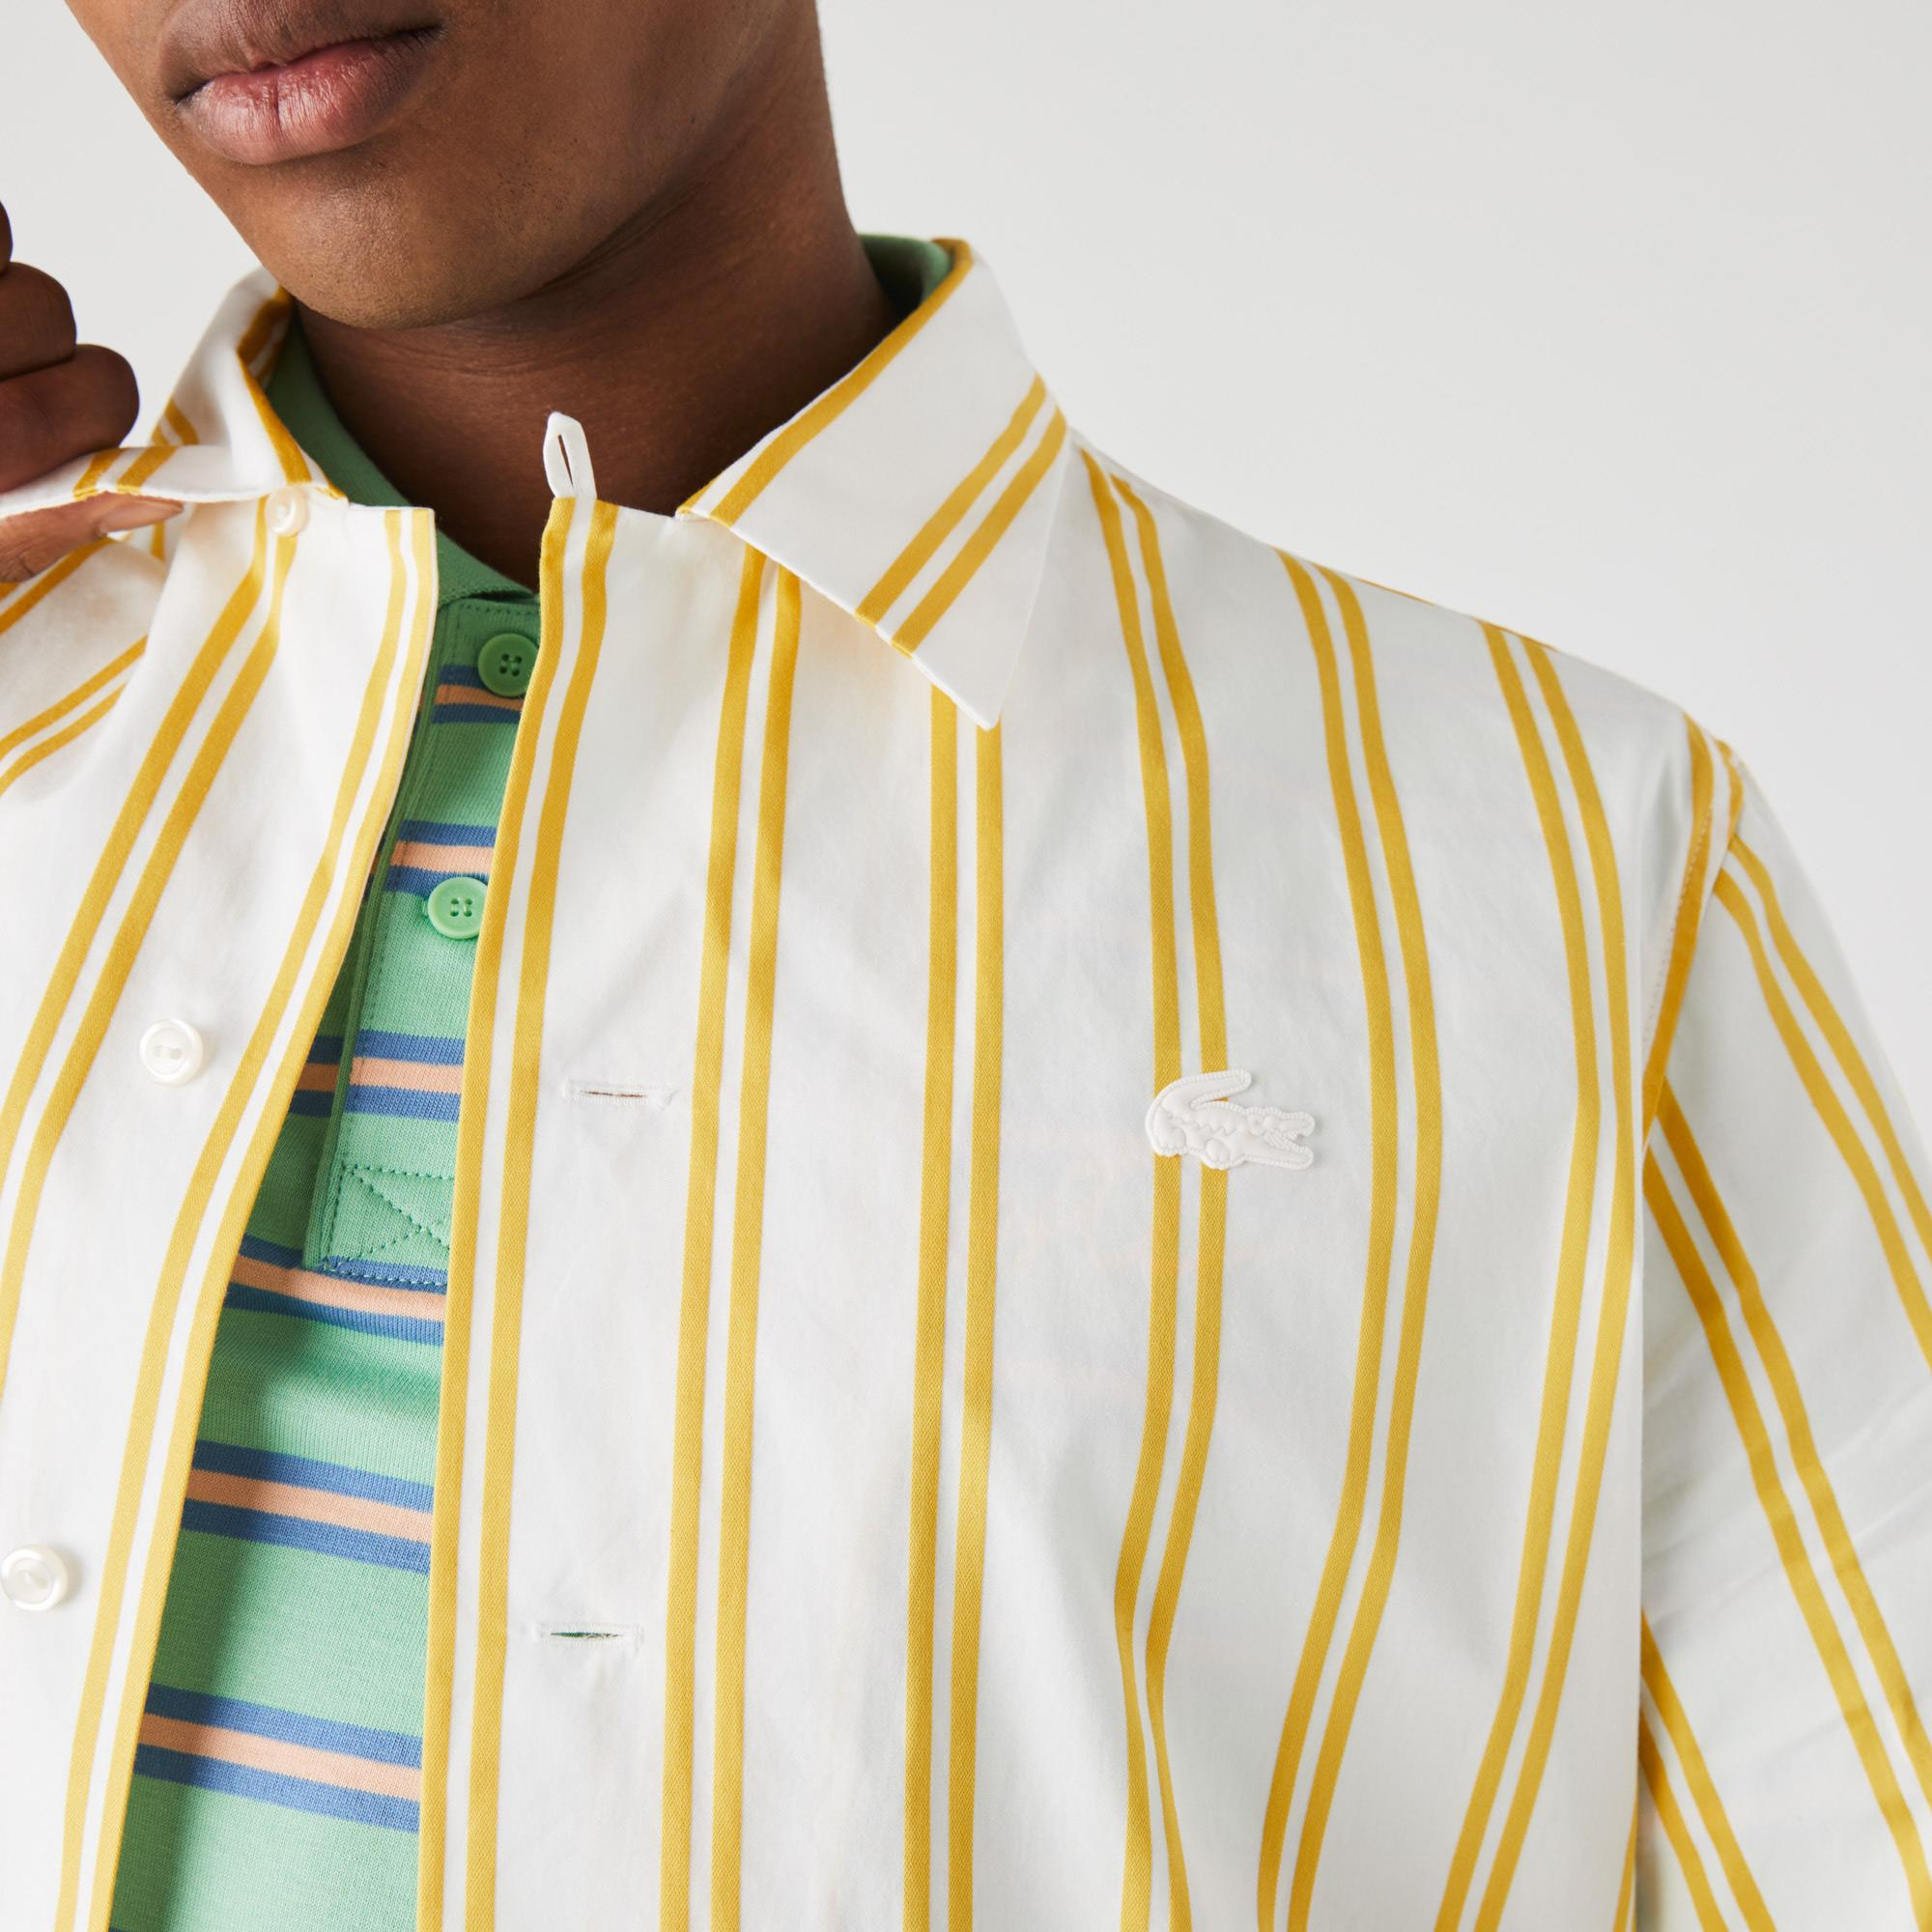 Lacoste L!VE Męska tkana koszula z długim rękawem